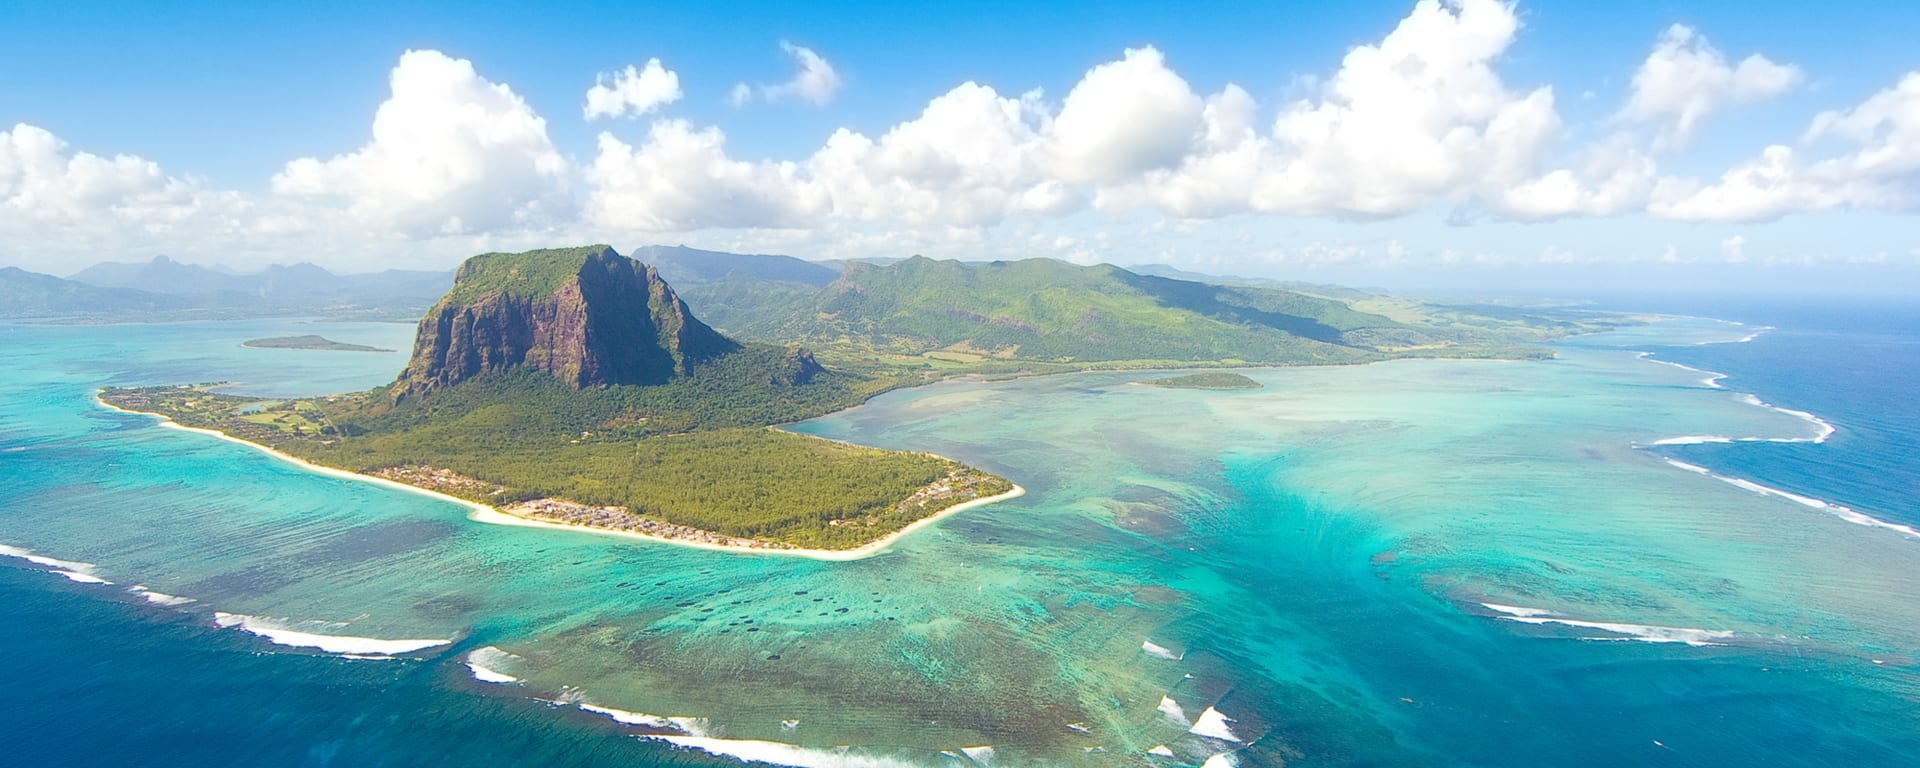 Mauritius entdecken mit Tischler Reisen: Mauritius Le Morne Halbinsel